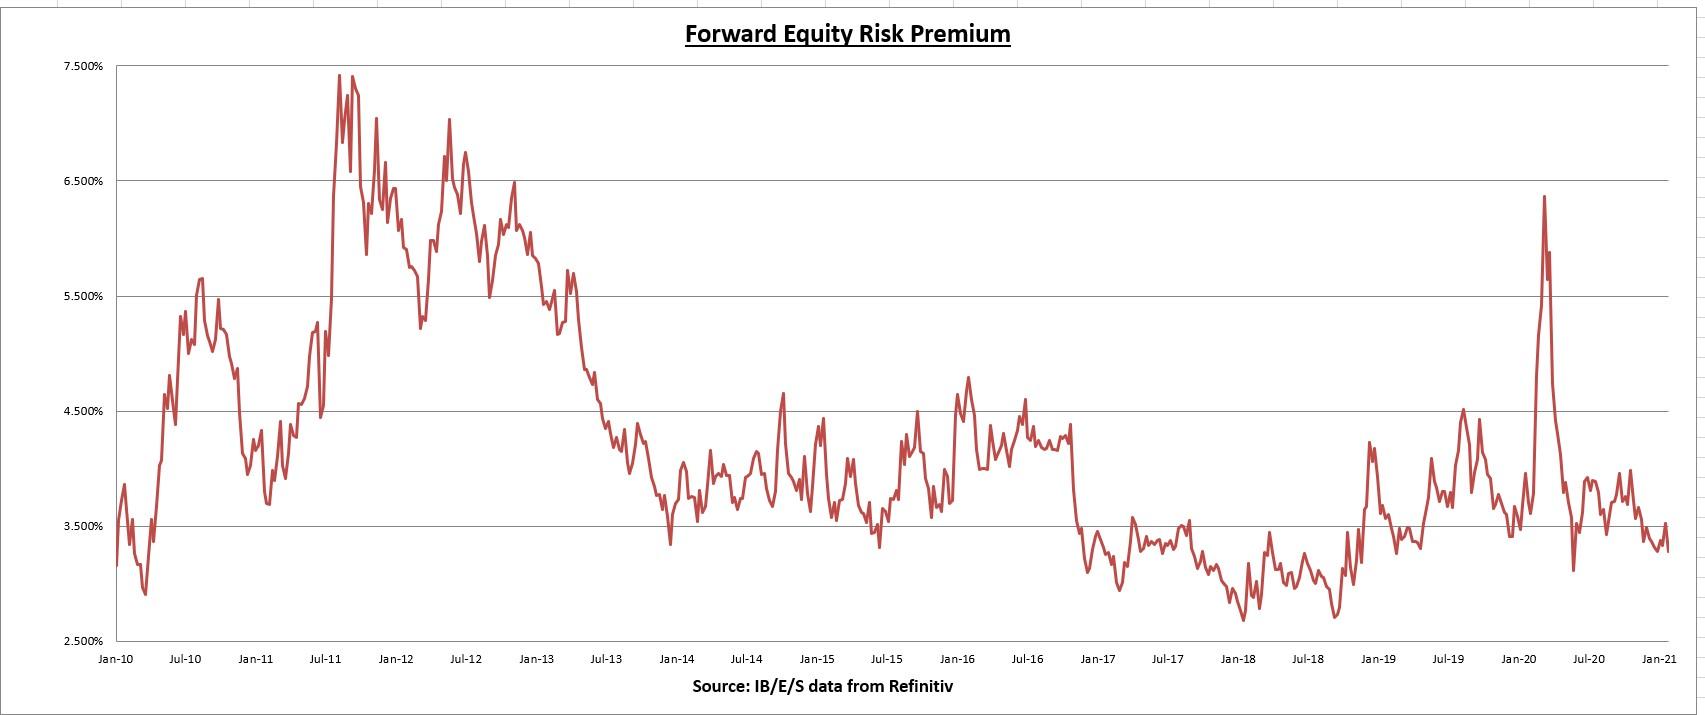 Forward Equity Risk Premium